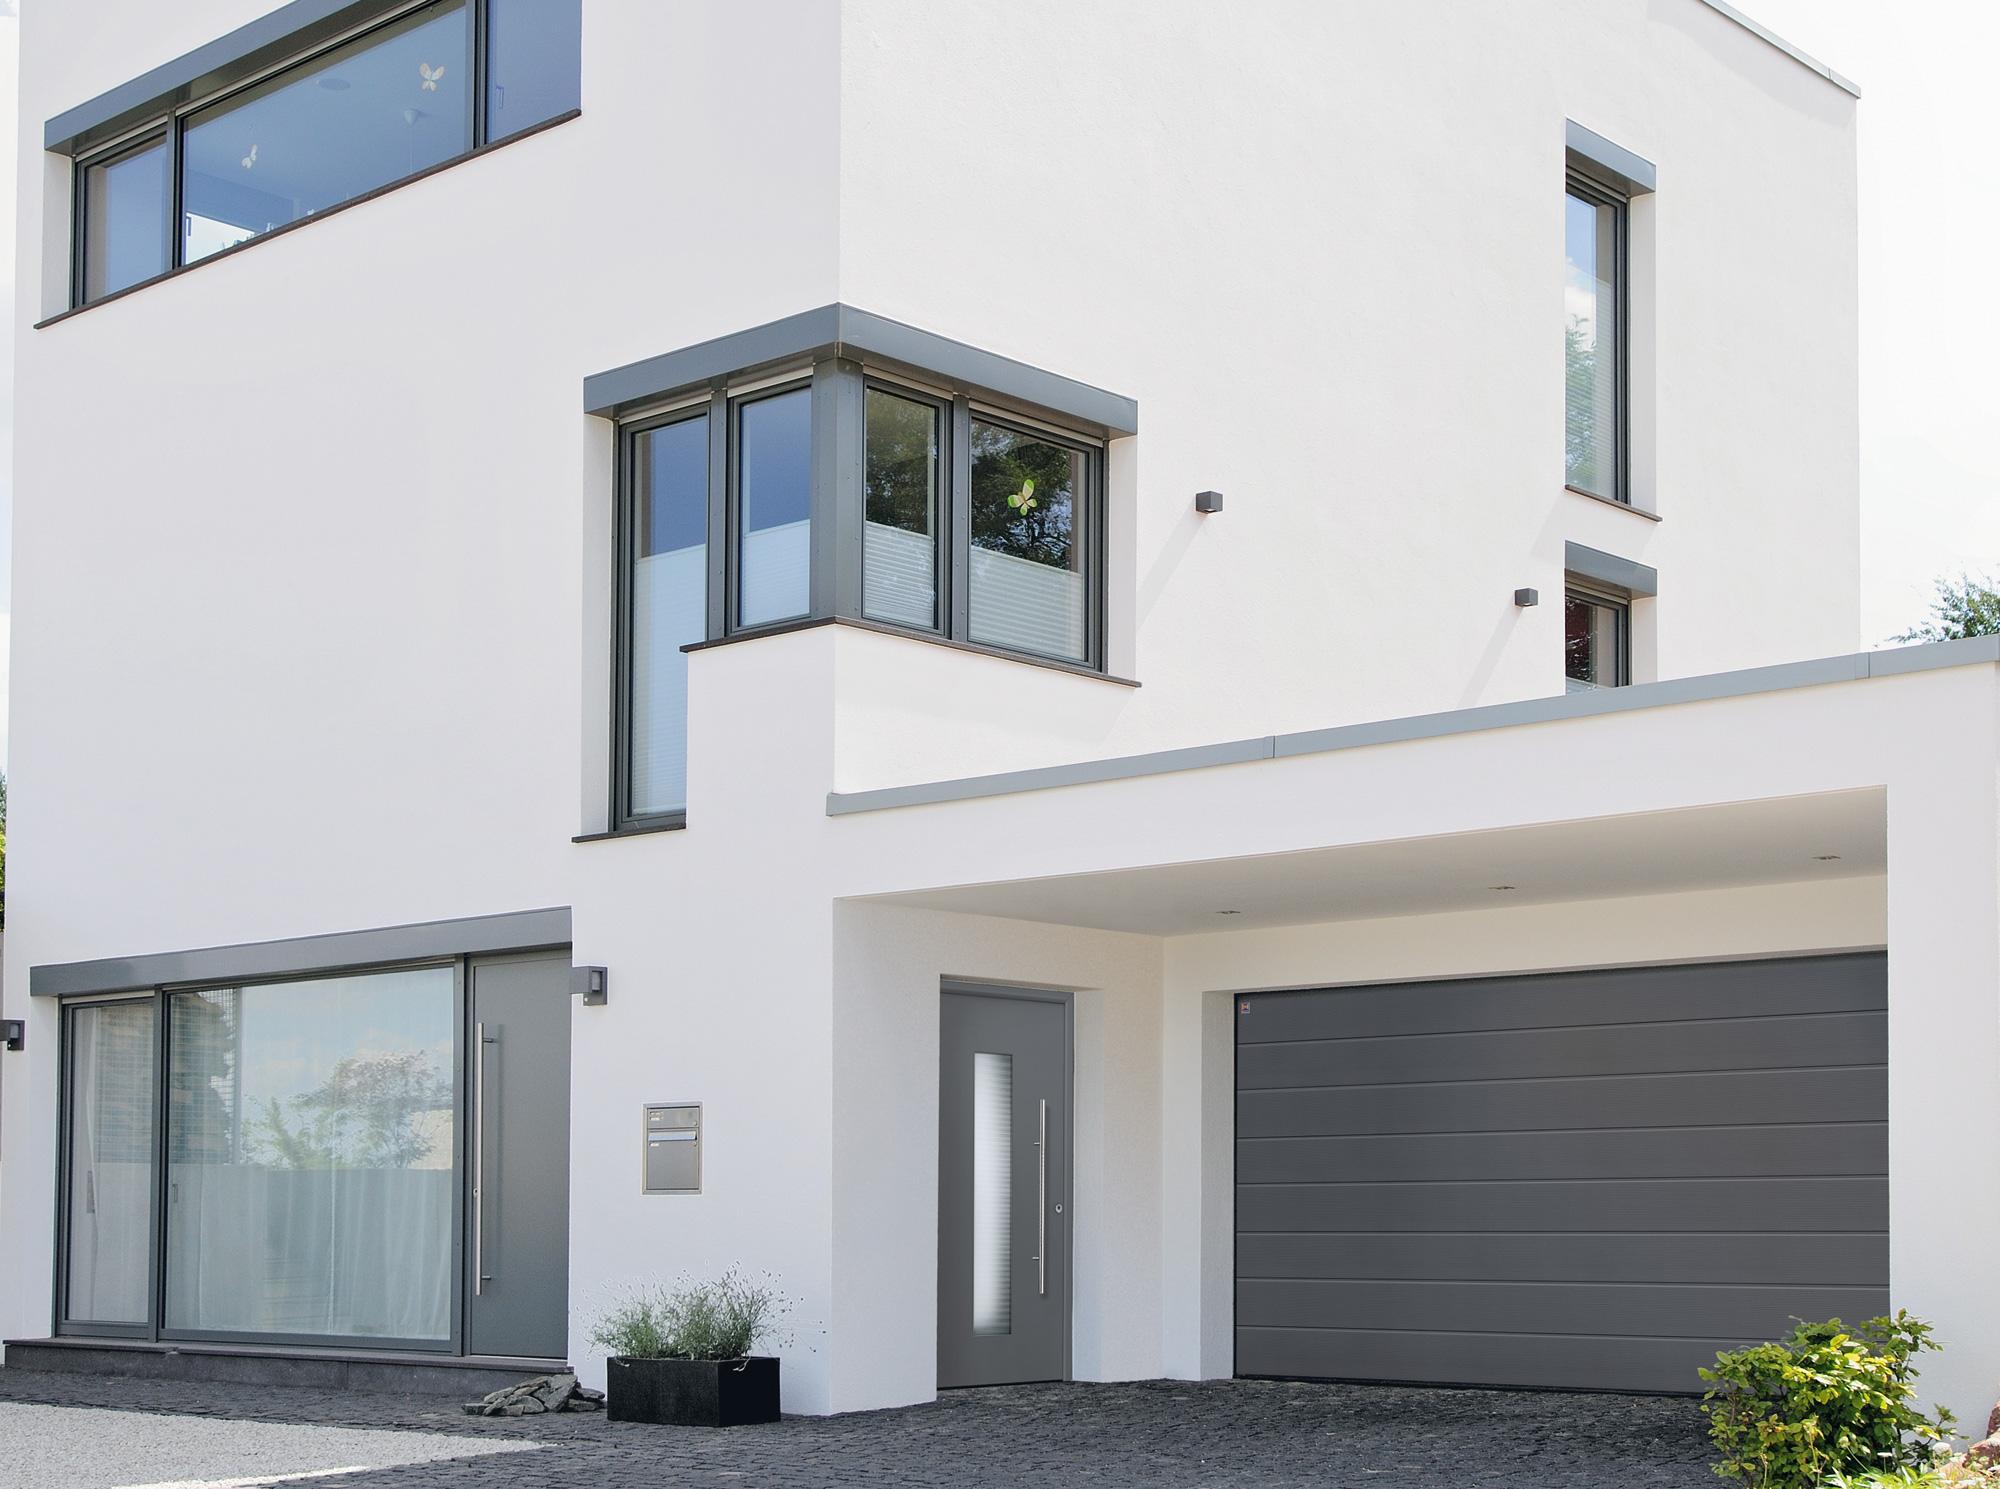 Hörmann türen  Türen – Schwing Fachgroßhandel GmbH, Röllbach